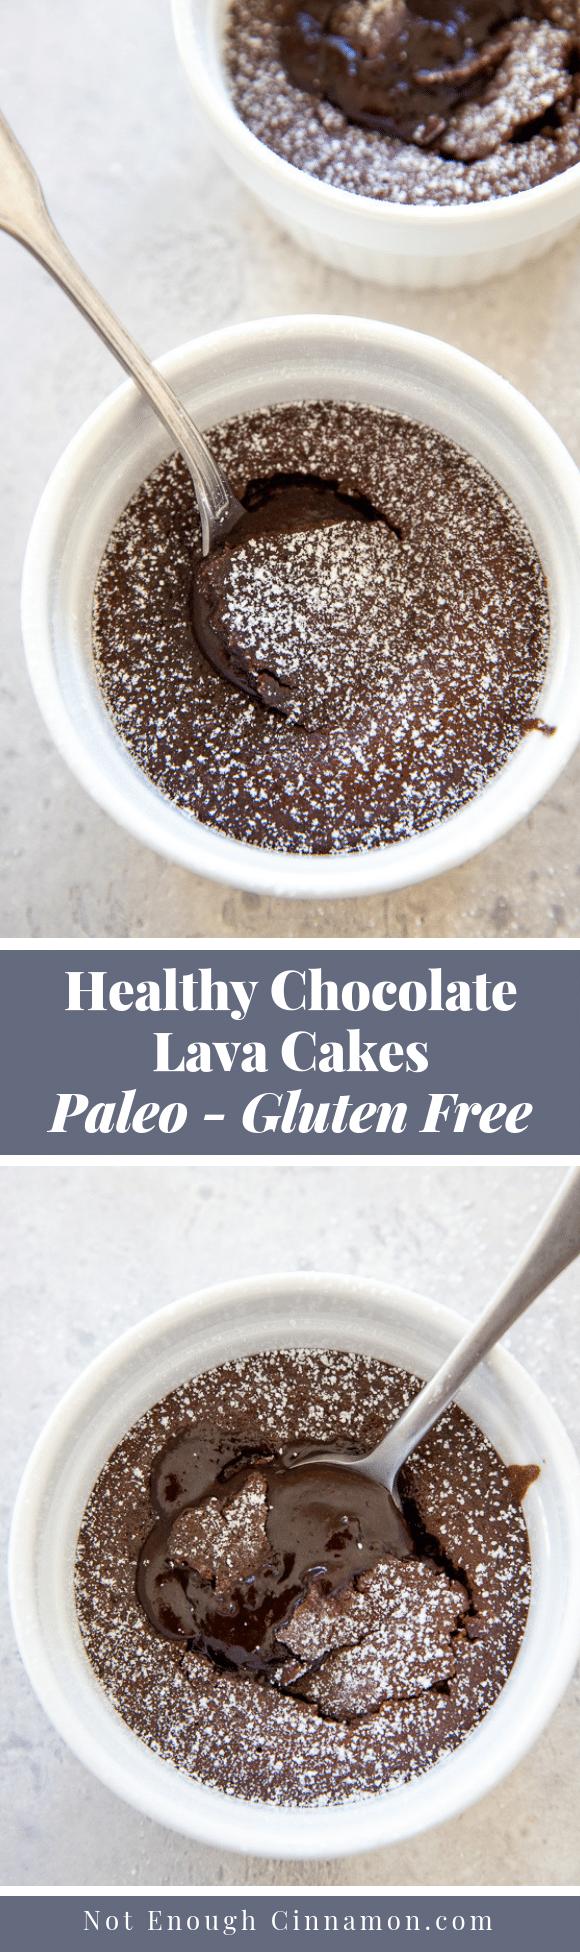 Healthy Chocolate Lava Cakes